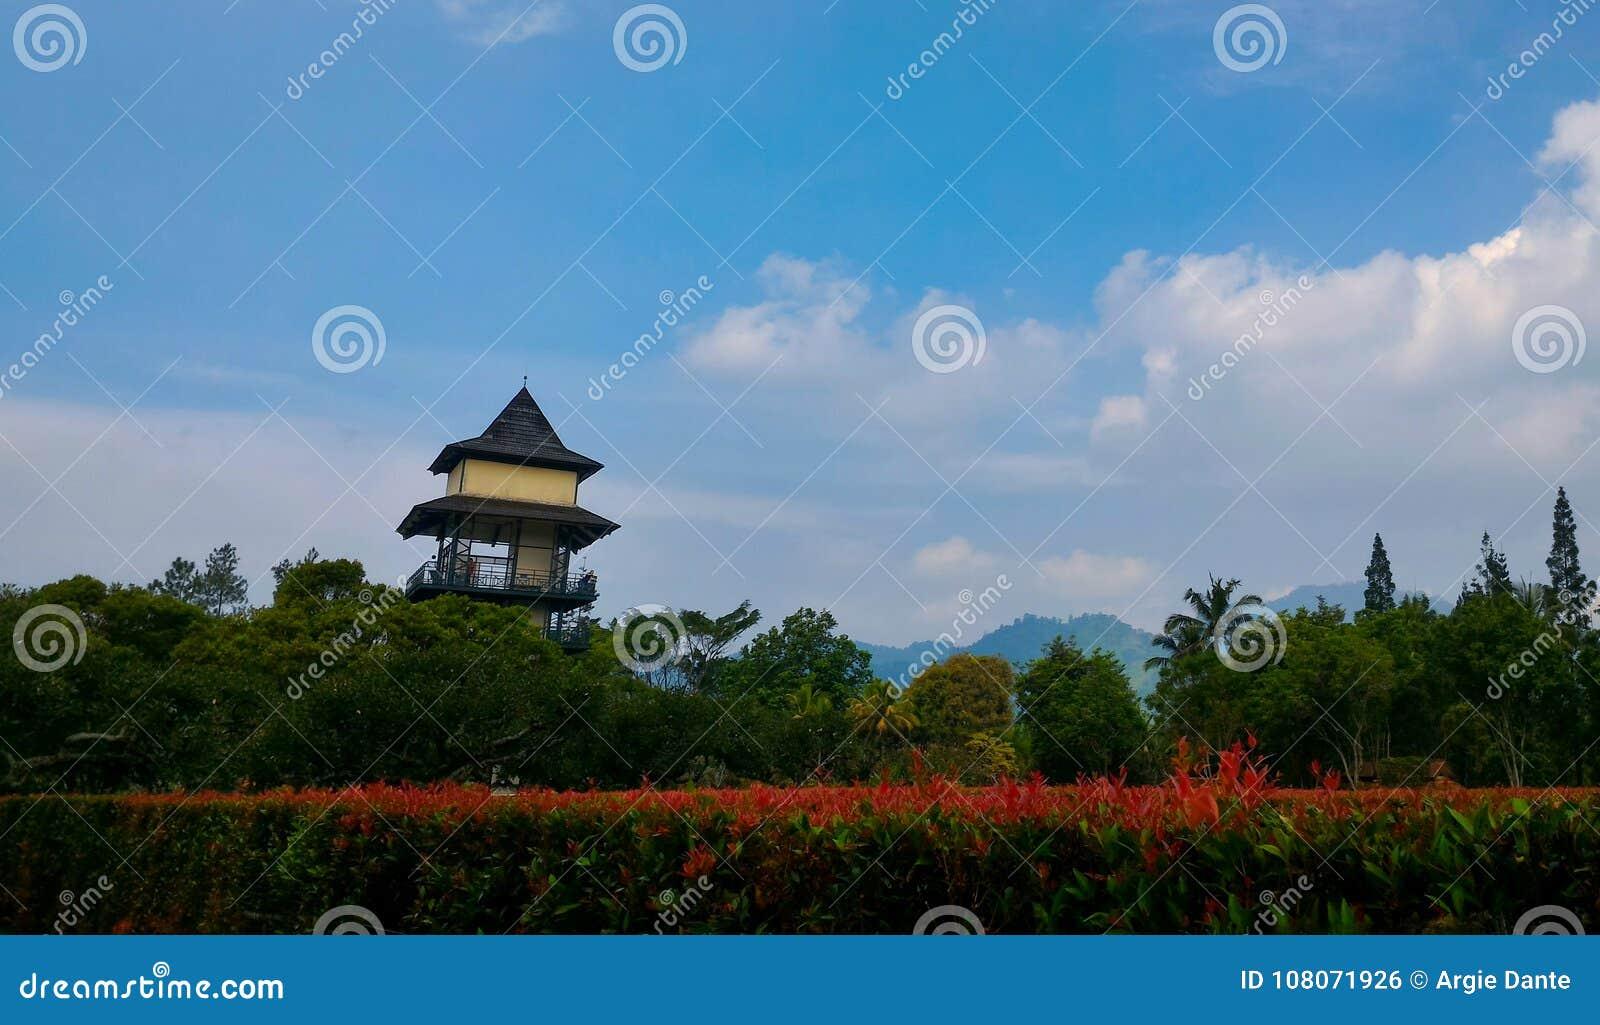 Beautiful tropical garden stock photo. Image of tropical - 108071926